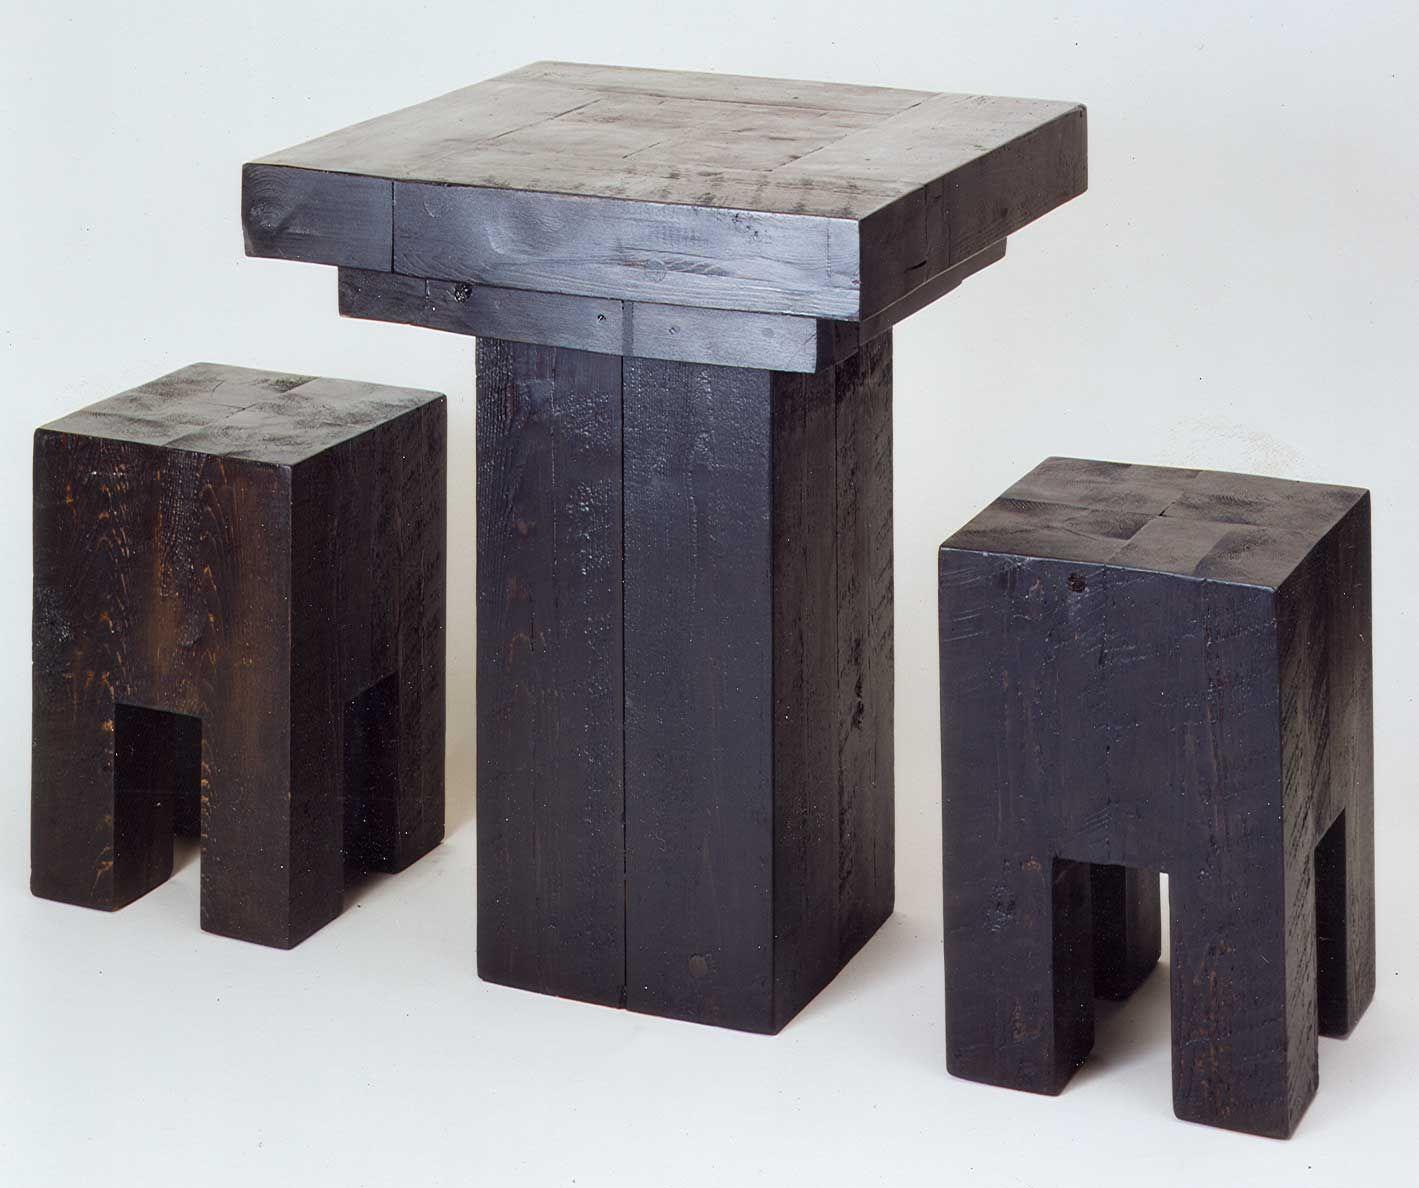 Antique Beam Chairs